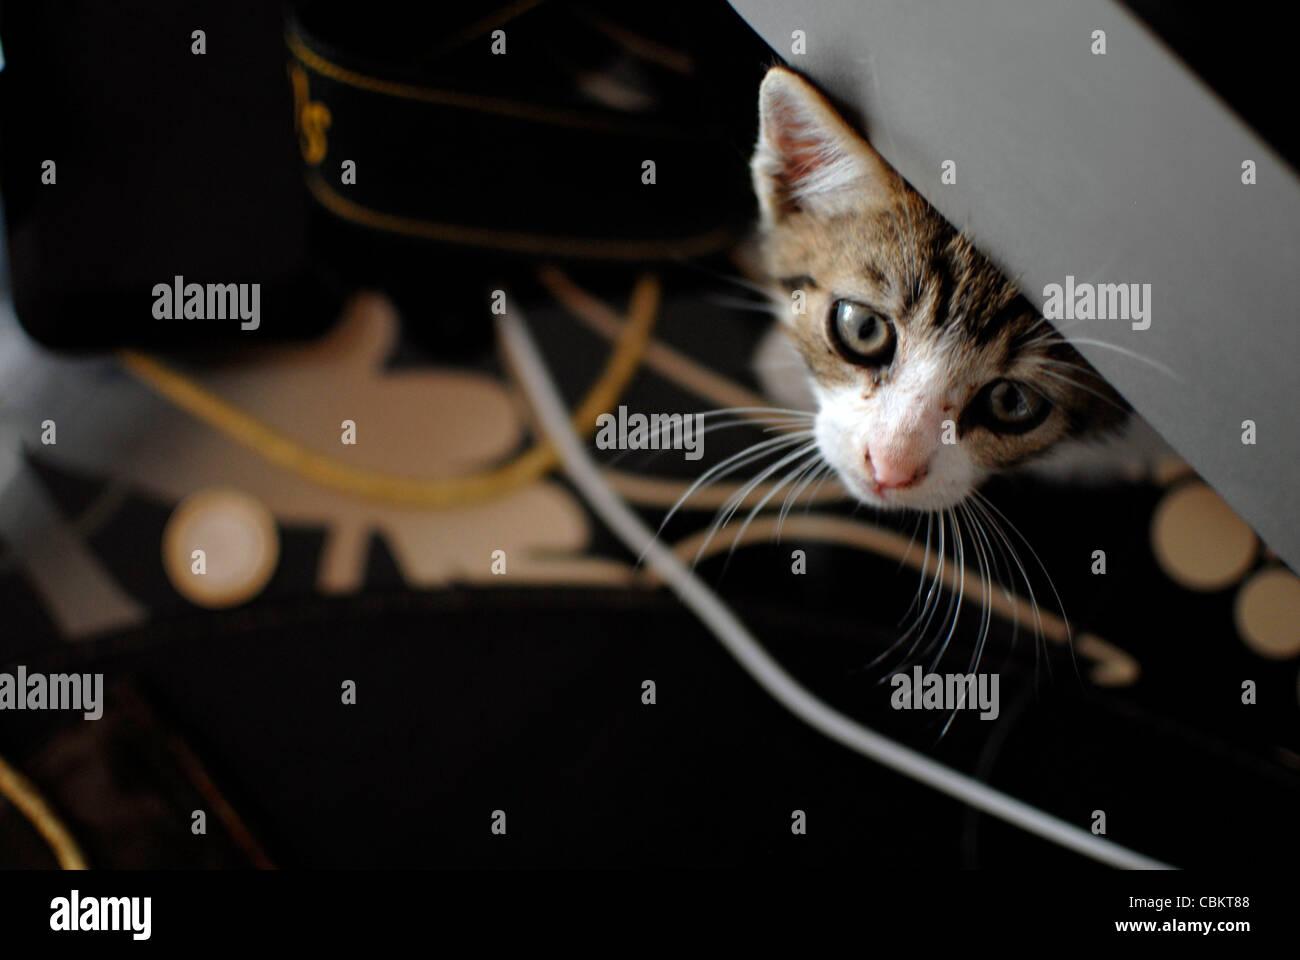 Hidden few weeks old kitten - Stock Image